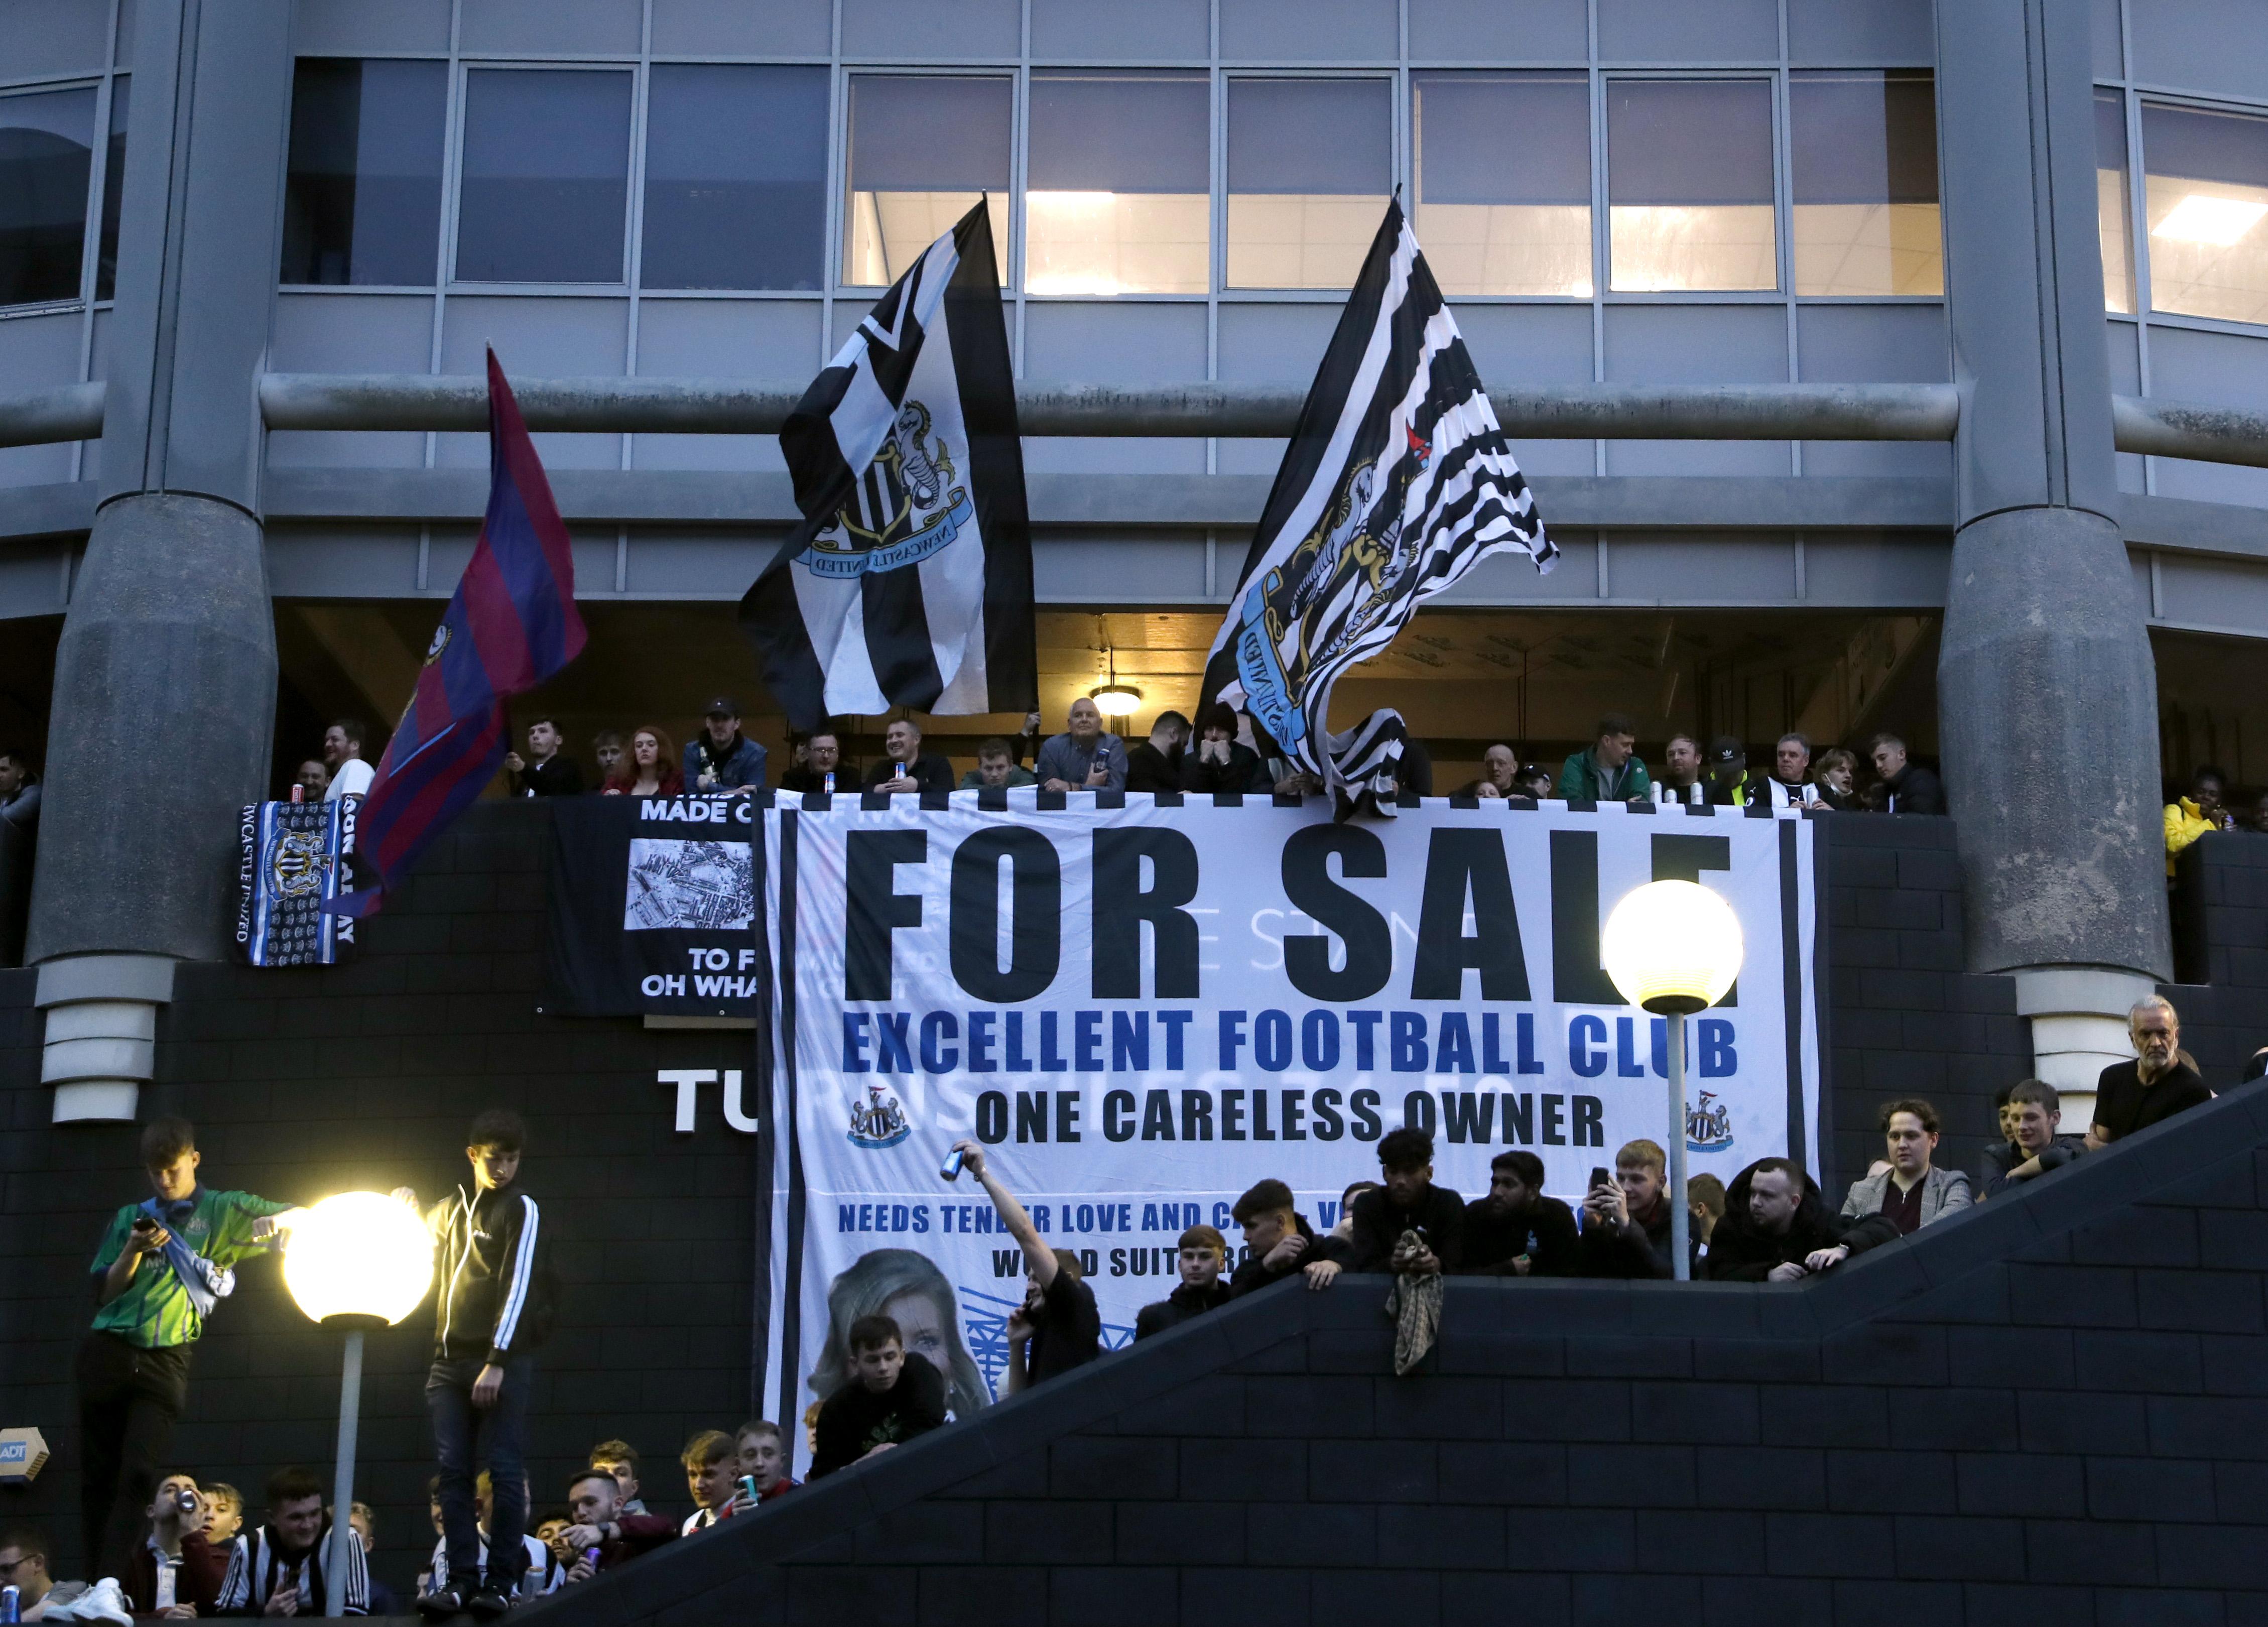 Newcastle United- Saudi Arabia backed consortium takes over English football club